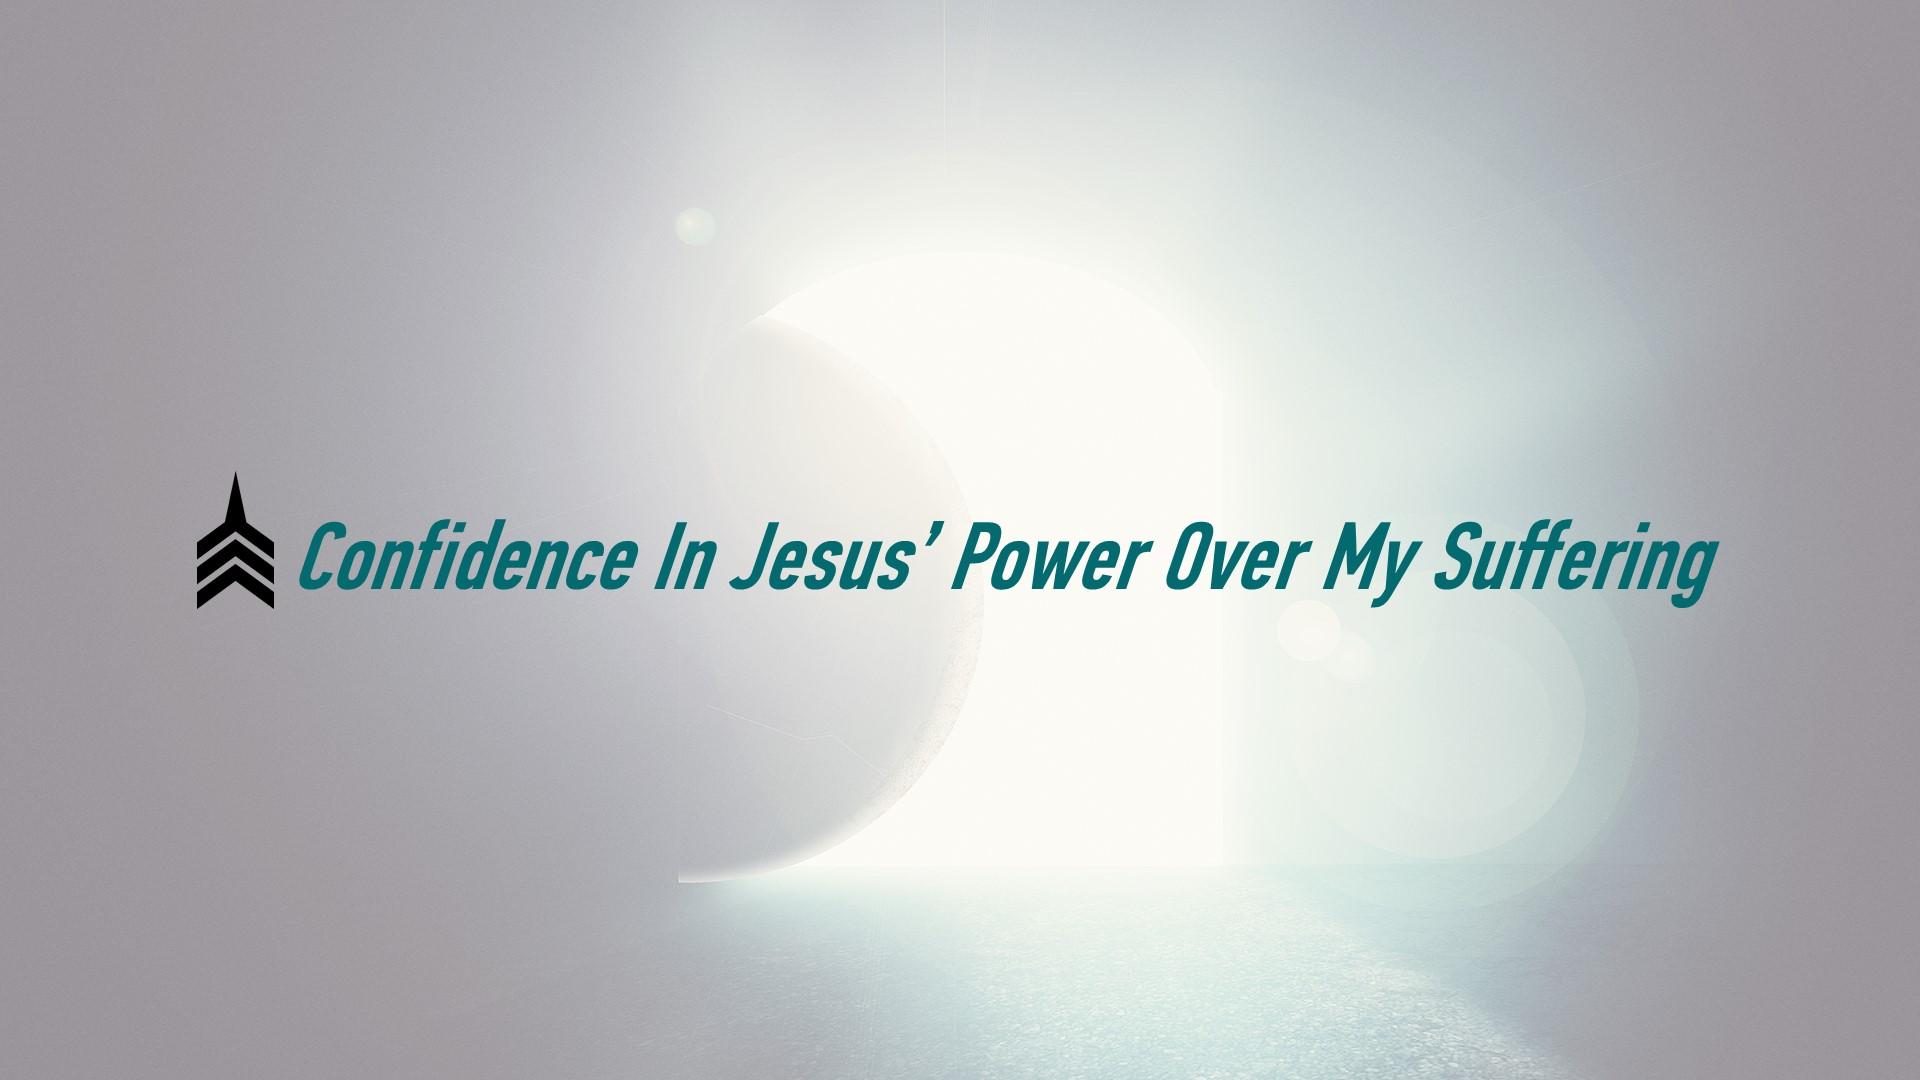 20180715 Confidence In Jesus' Power Over My Suffering.jpg